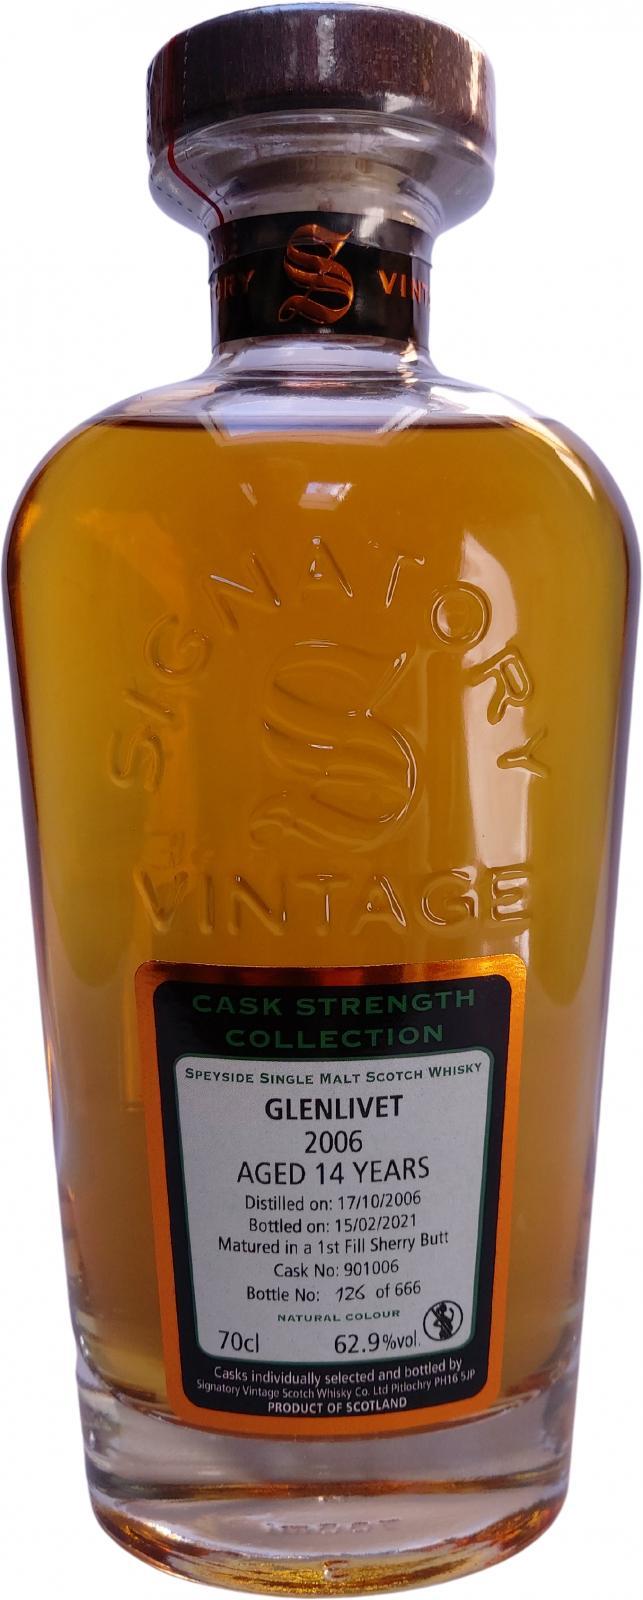 Glenlivet 2006 SV